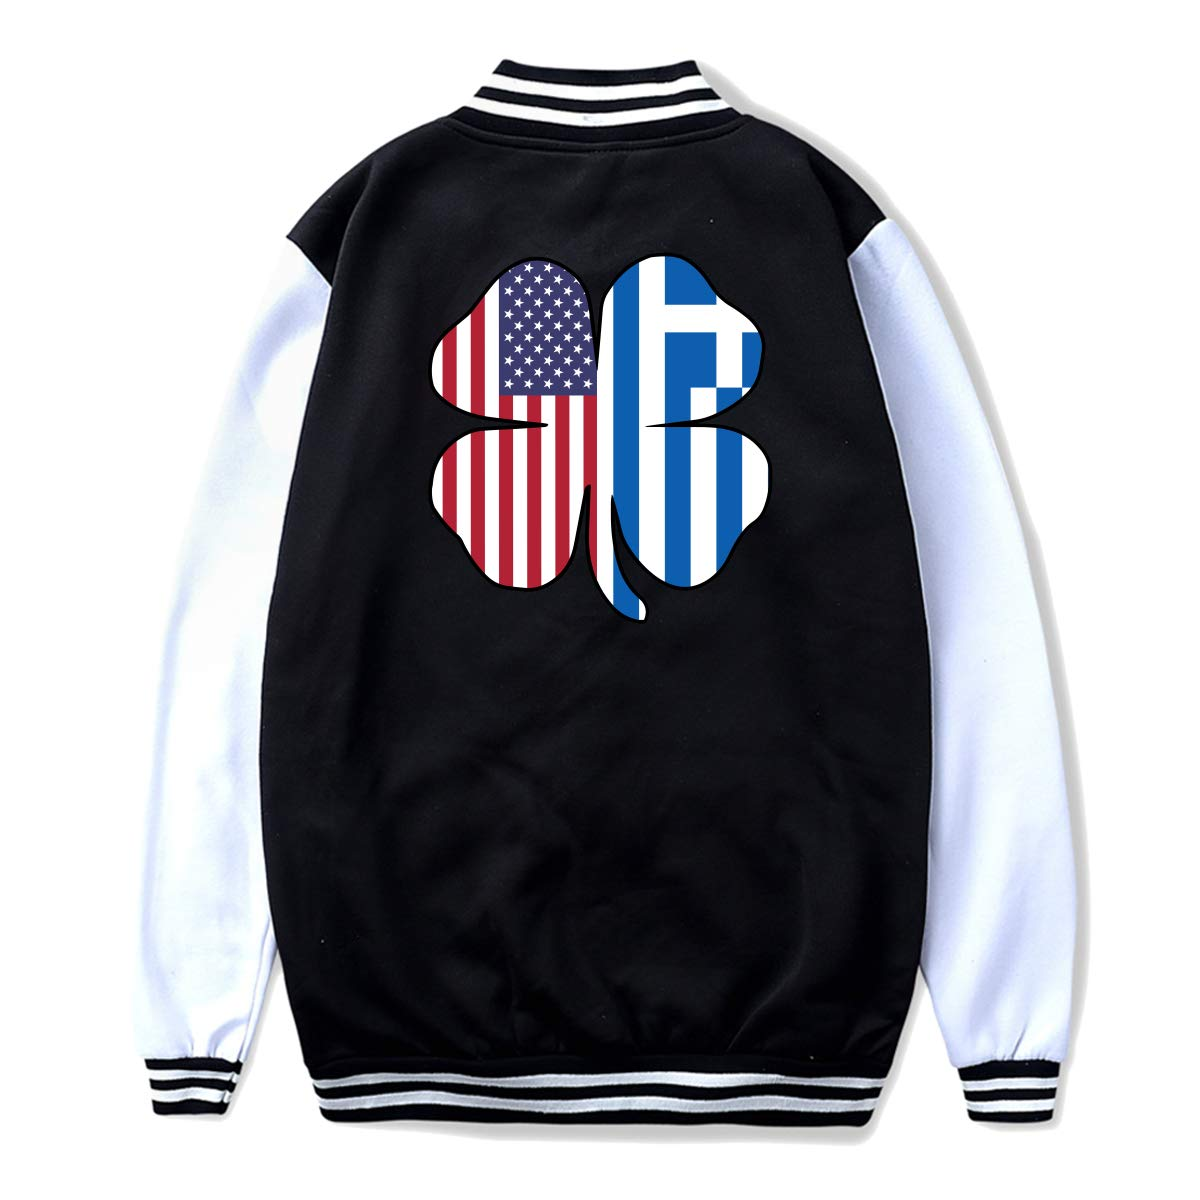 NJKM5MJ Unisex Youth Baseball Uniform Jacket American Greece Greek Flag Shamrock Hoodie Coat Sweater Sweatshirt Back Print